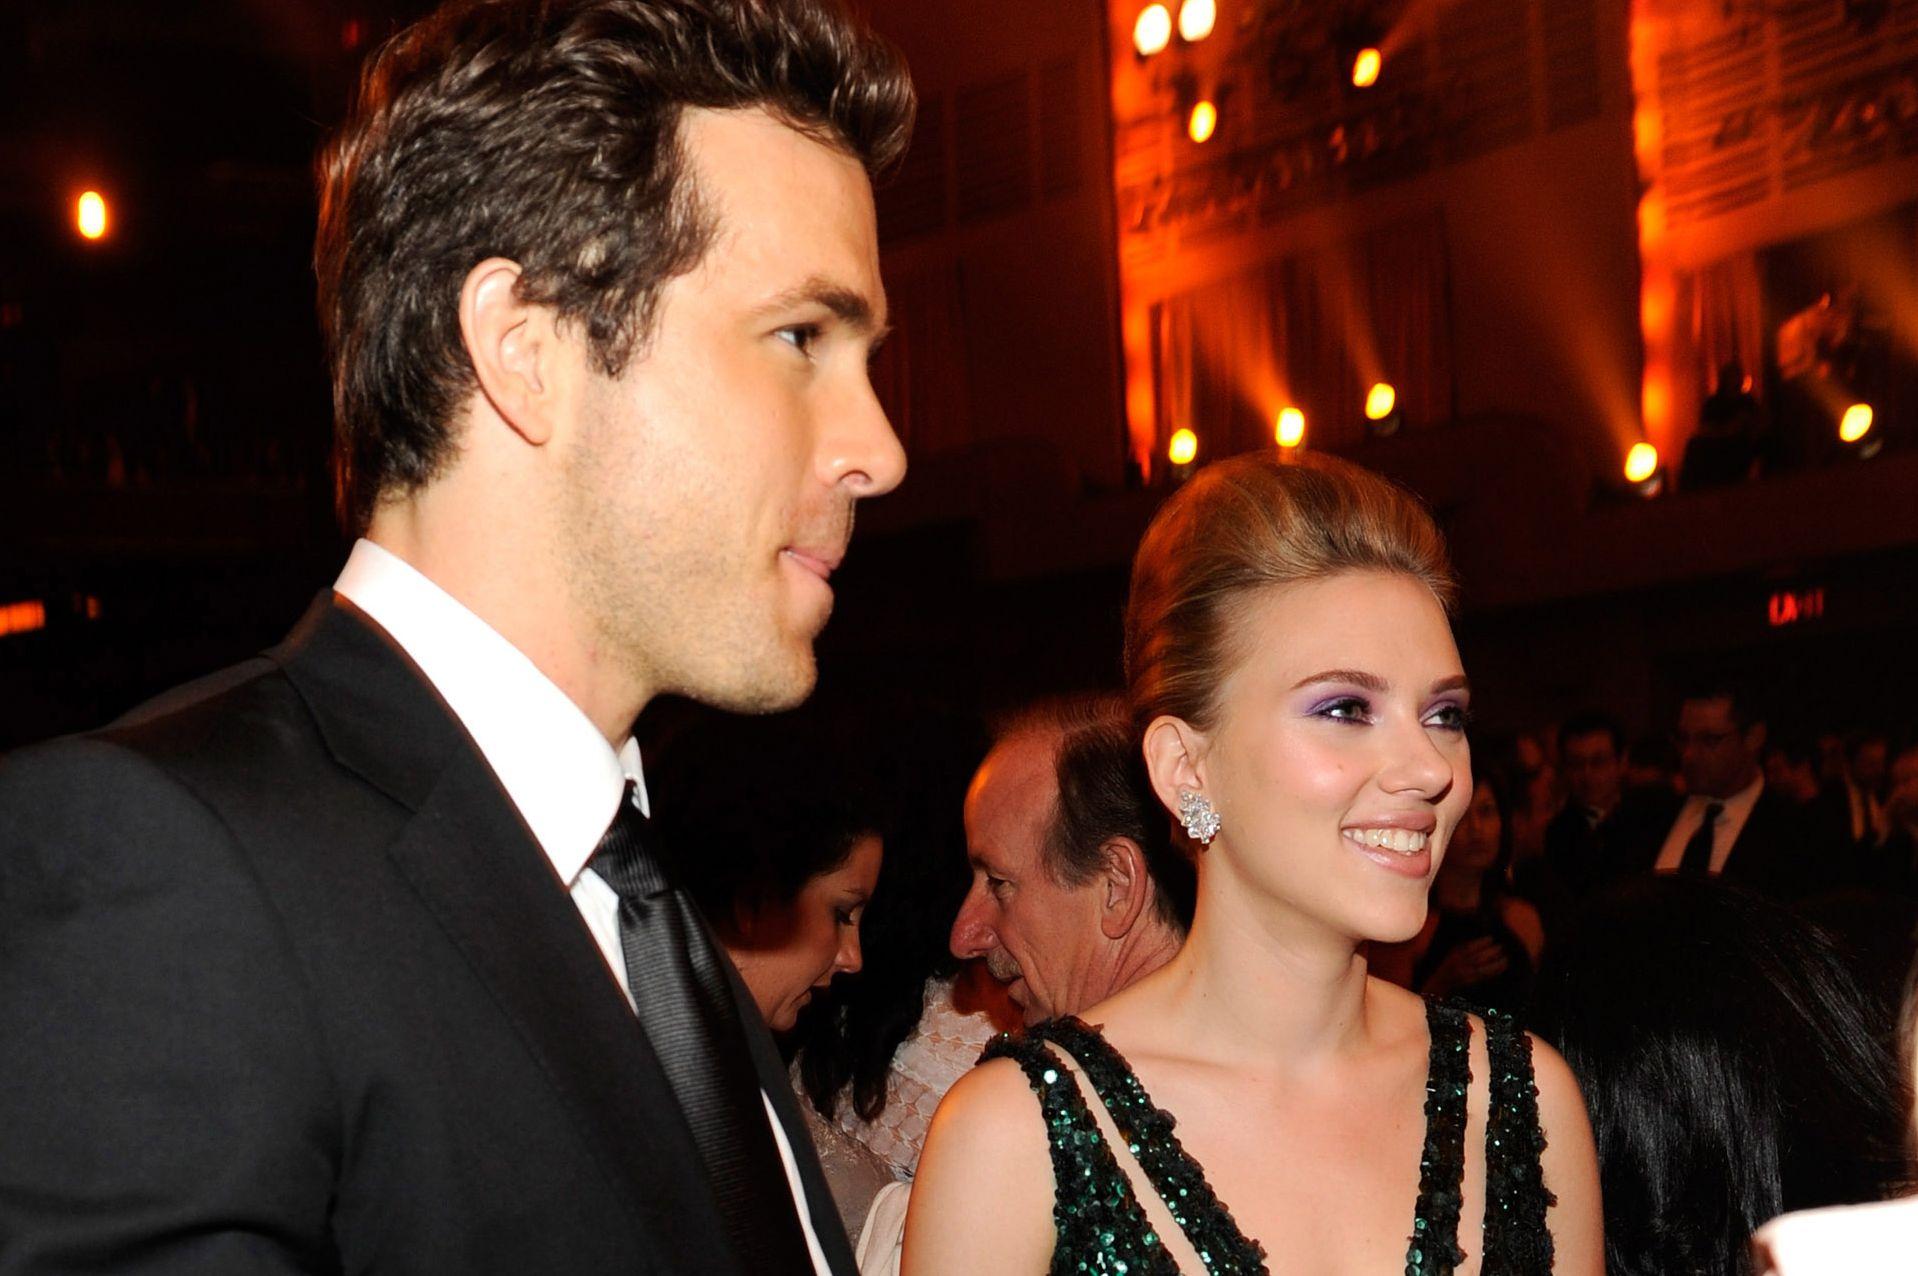 Ryan Reynolds and Scarlett Johansson